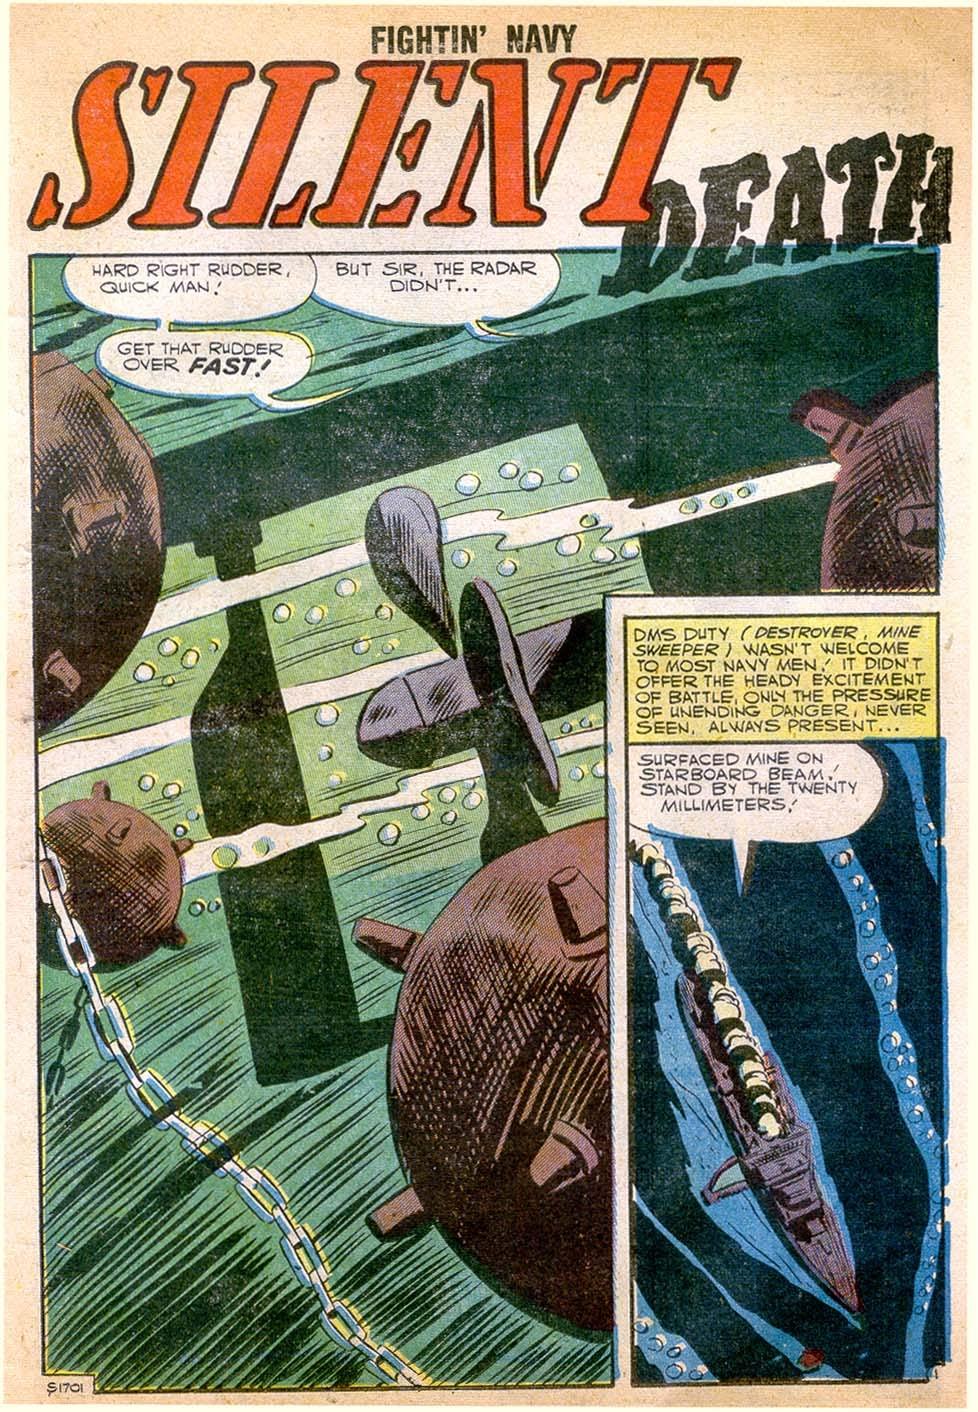 Read online Fightin' Navy comic -  Issue #79 - 11